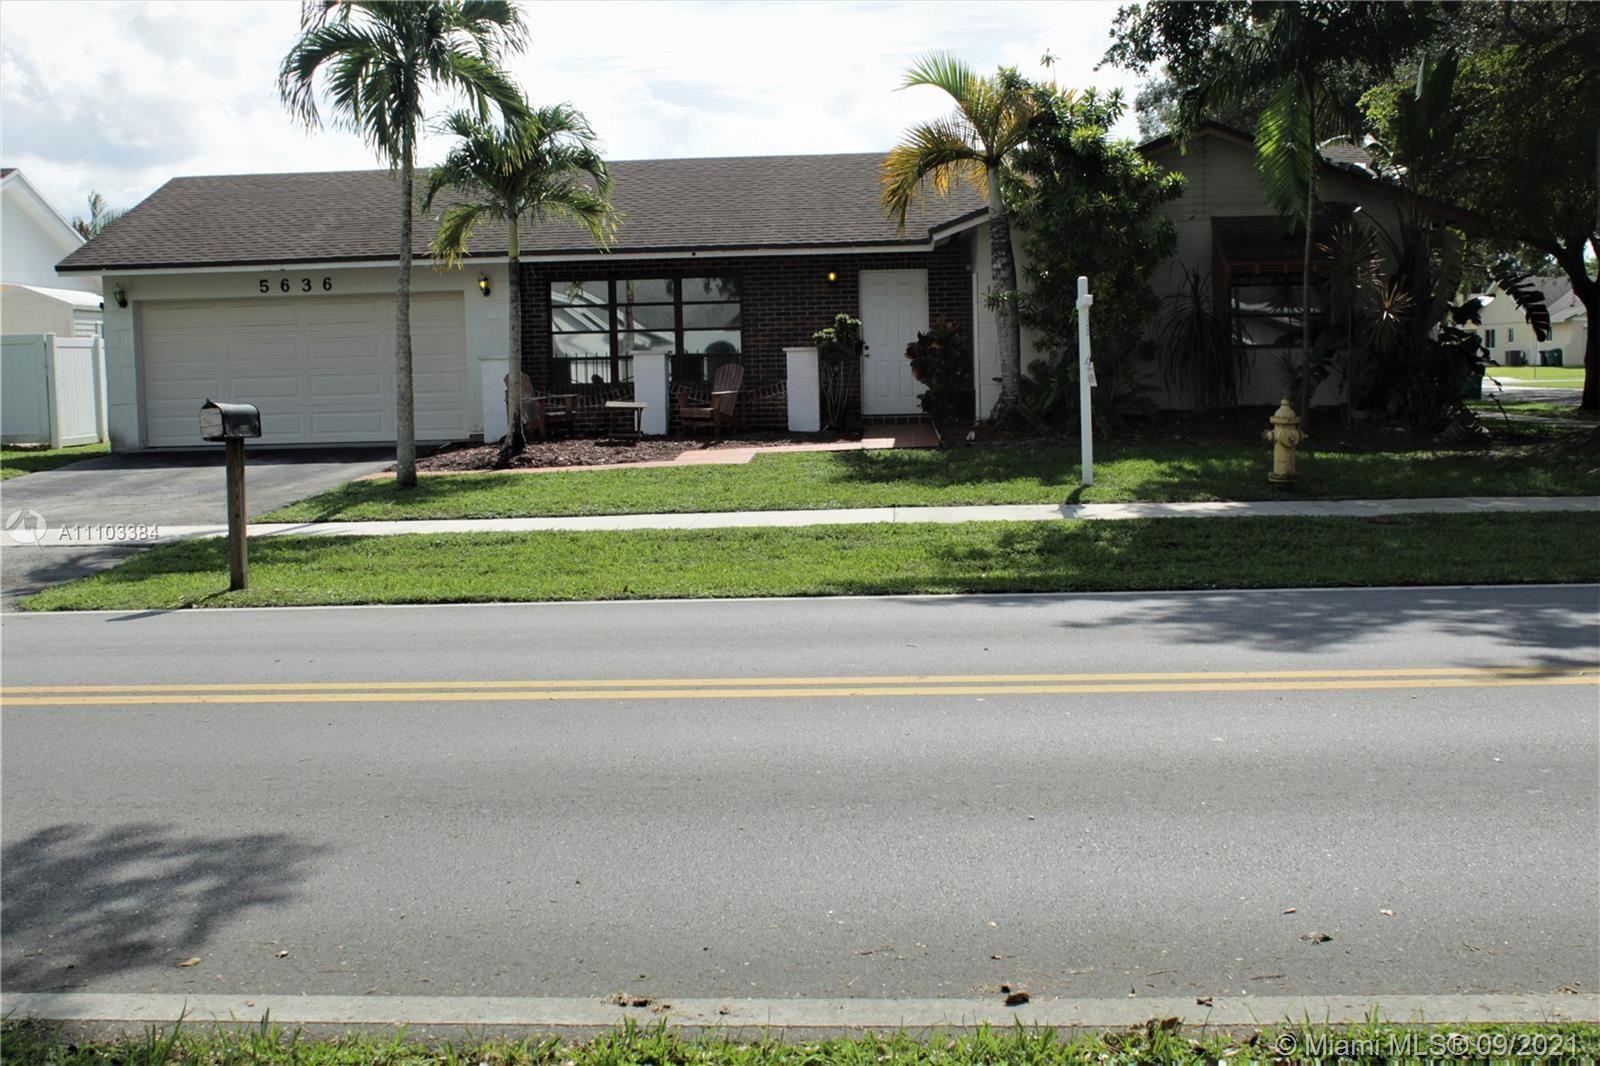 5636 SW 118th Ave, Cooper City, FL 33330 - #: A11103384